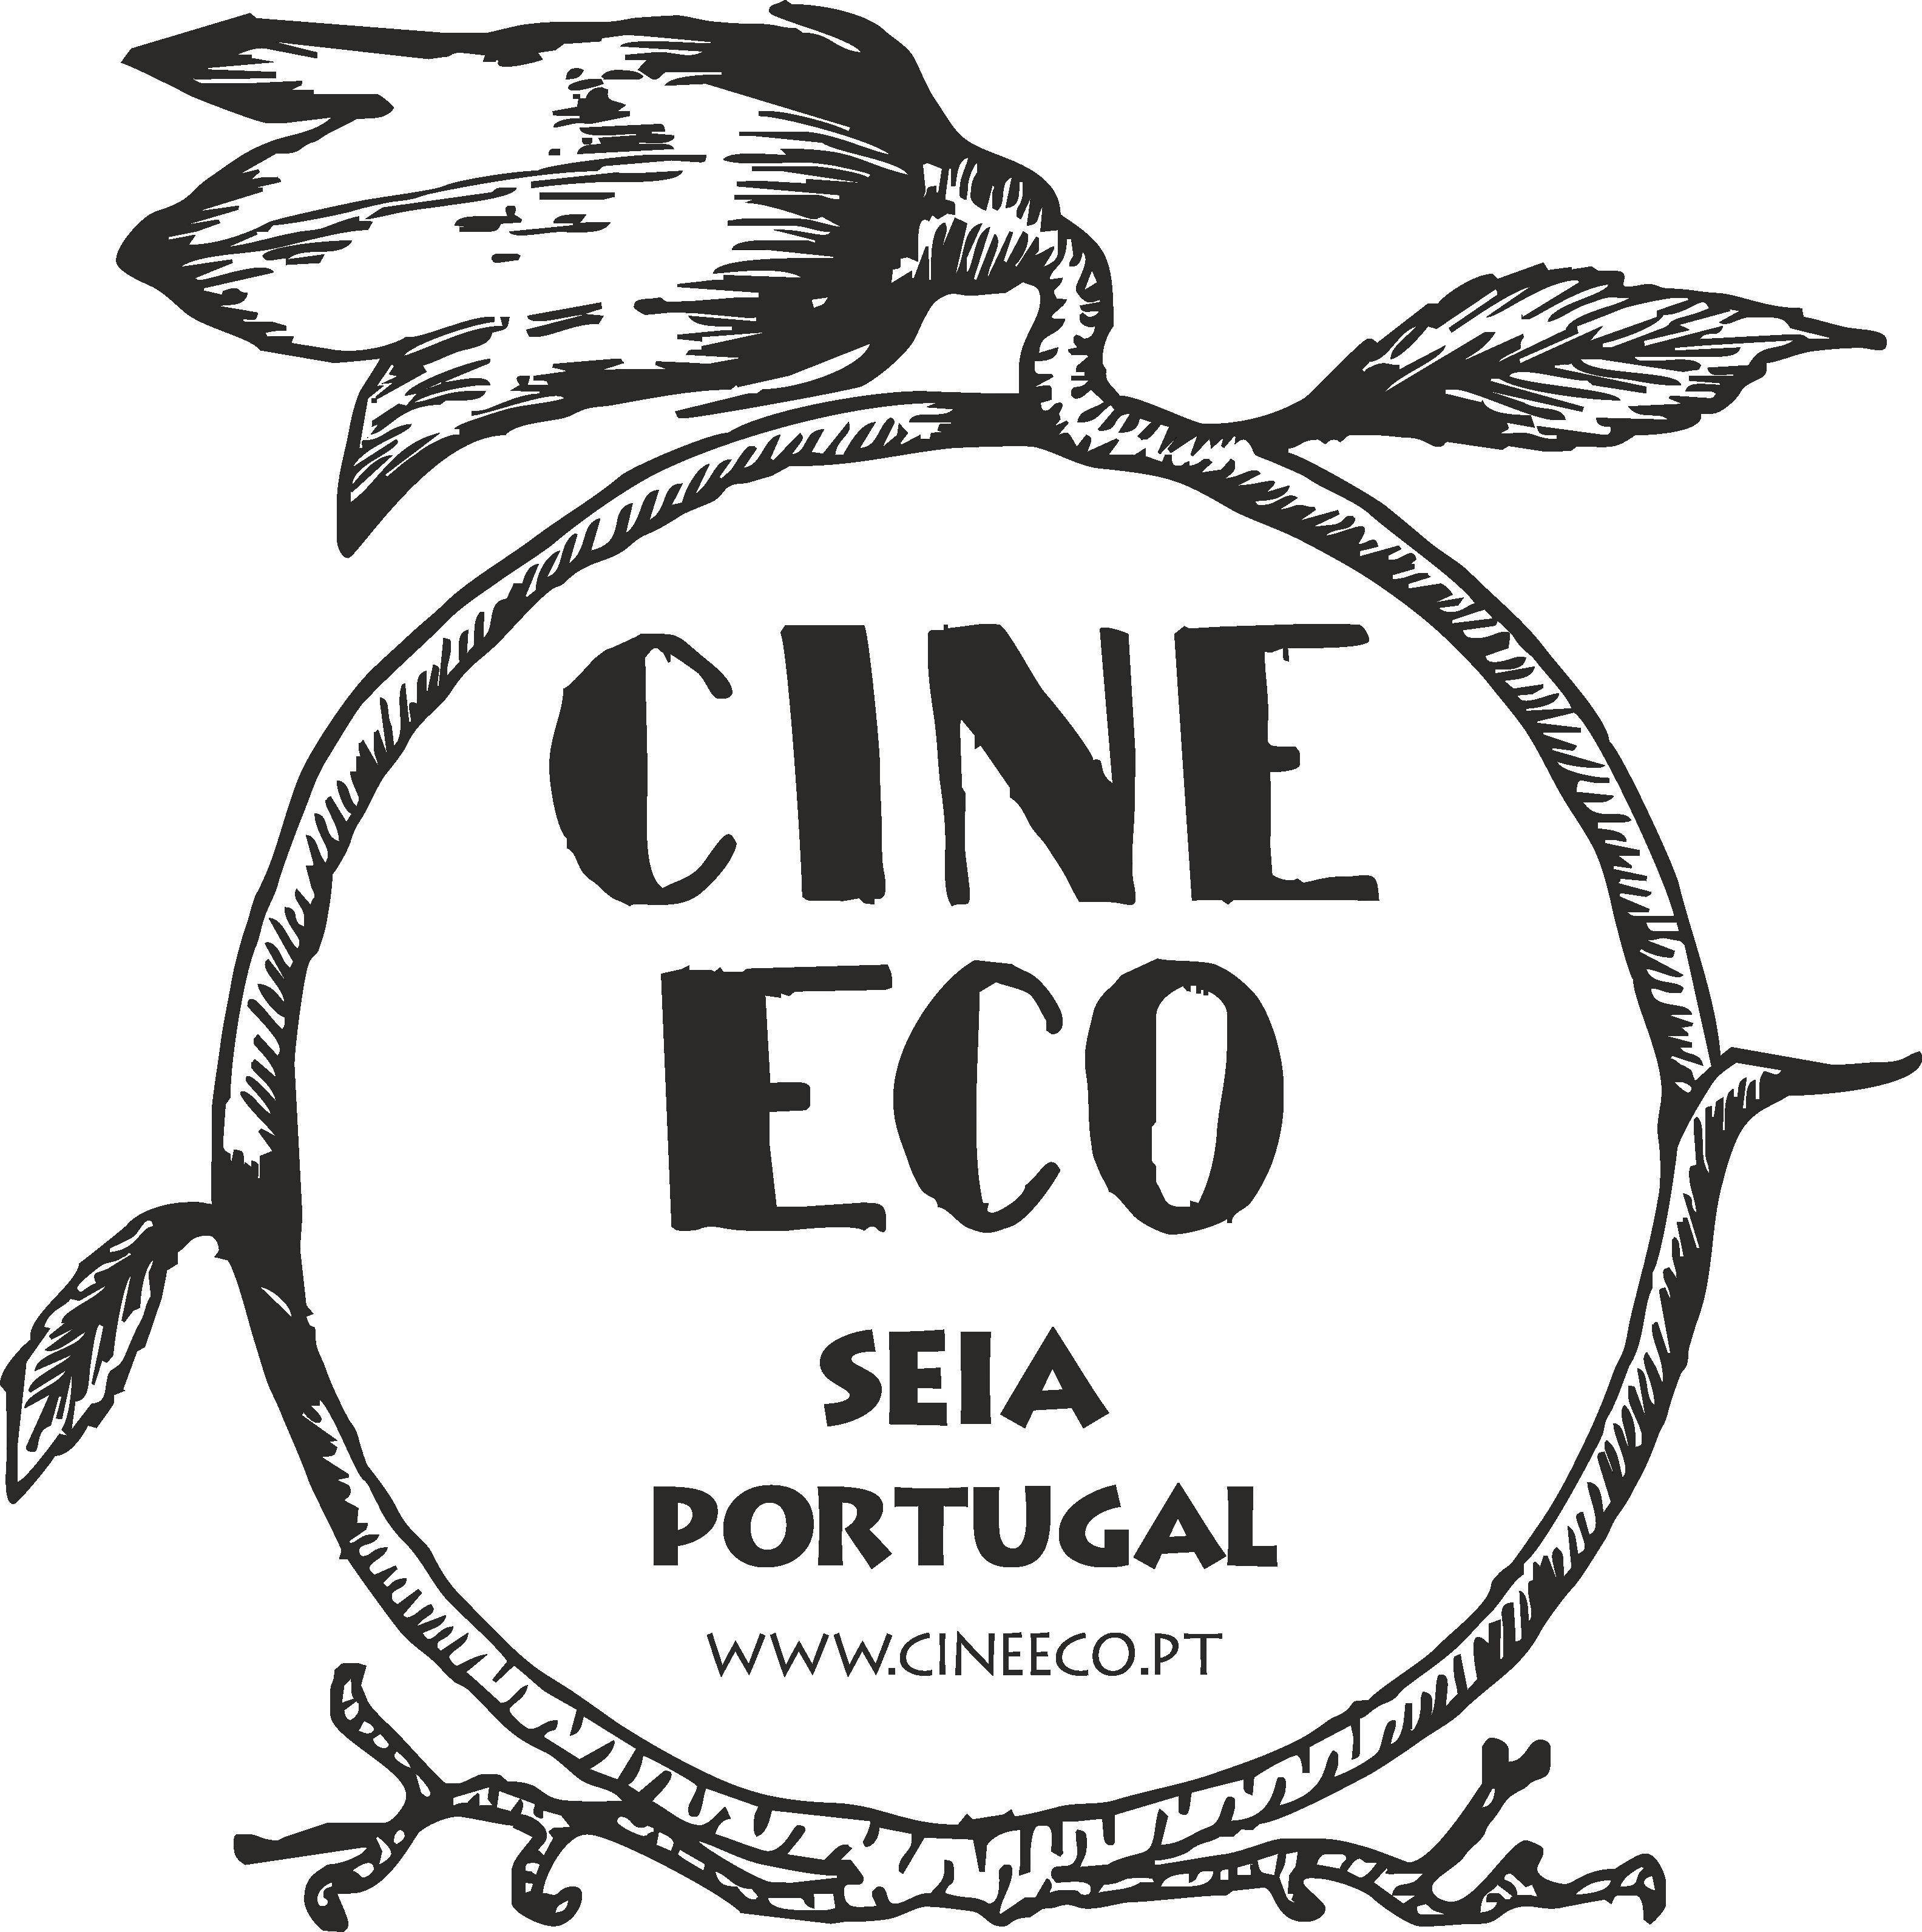 logo_CineEco_pb.JPG